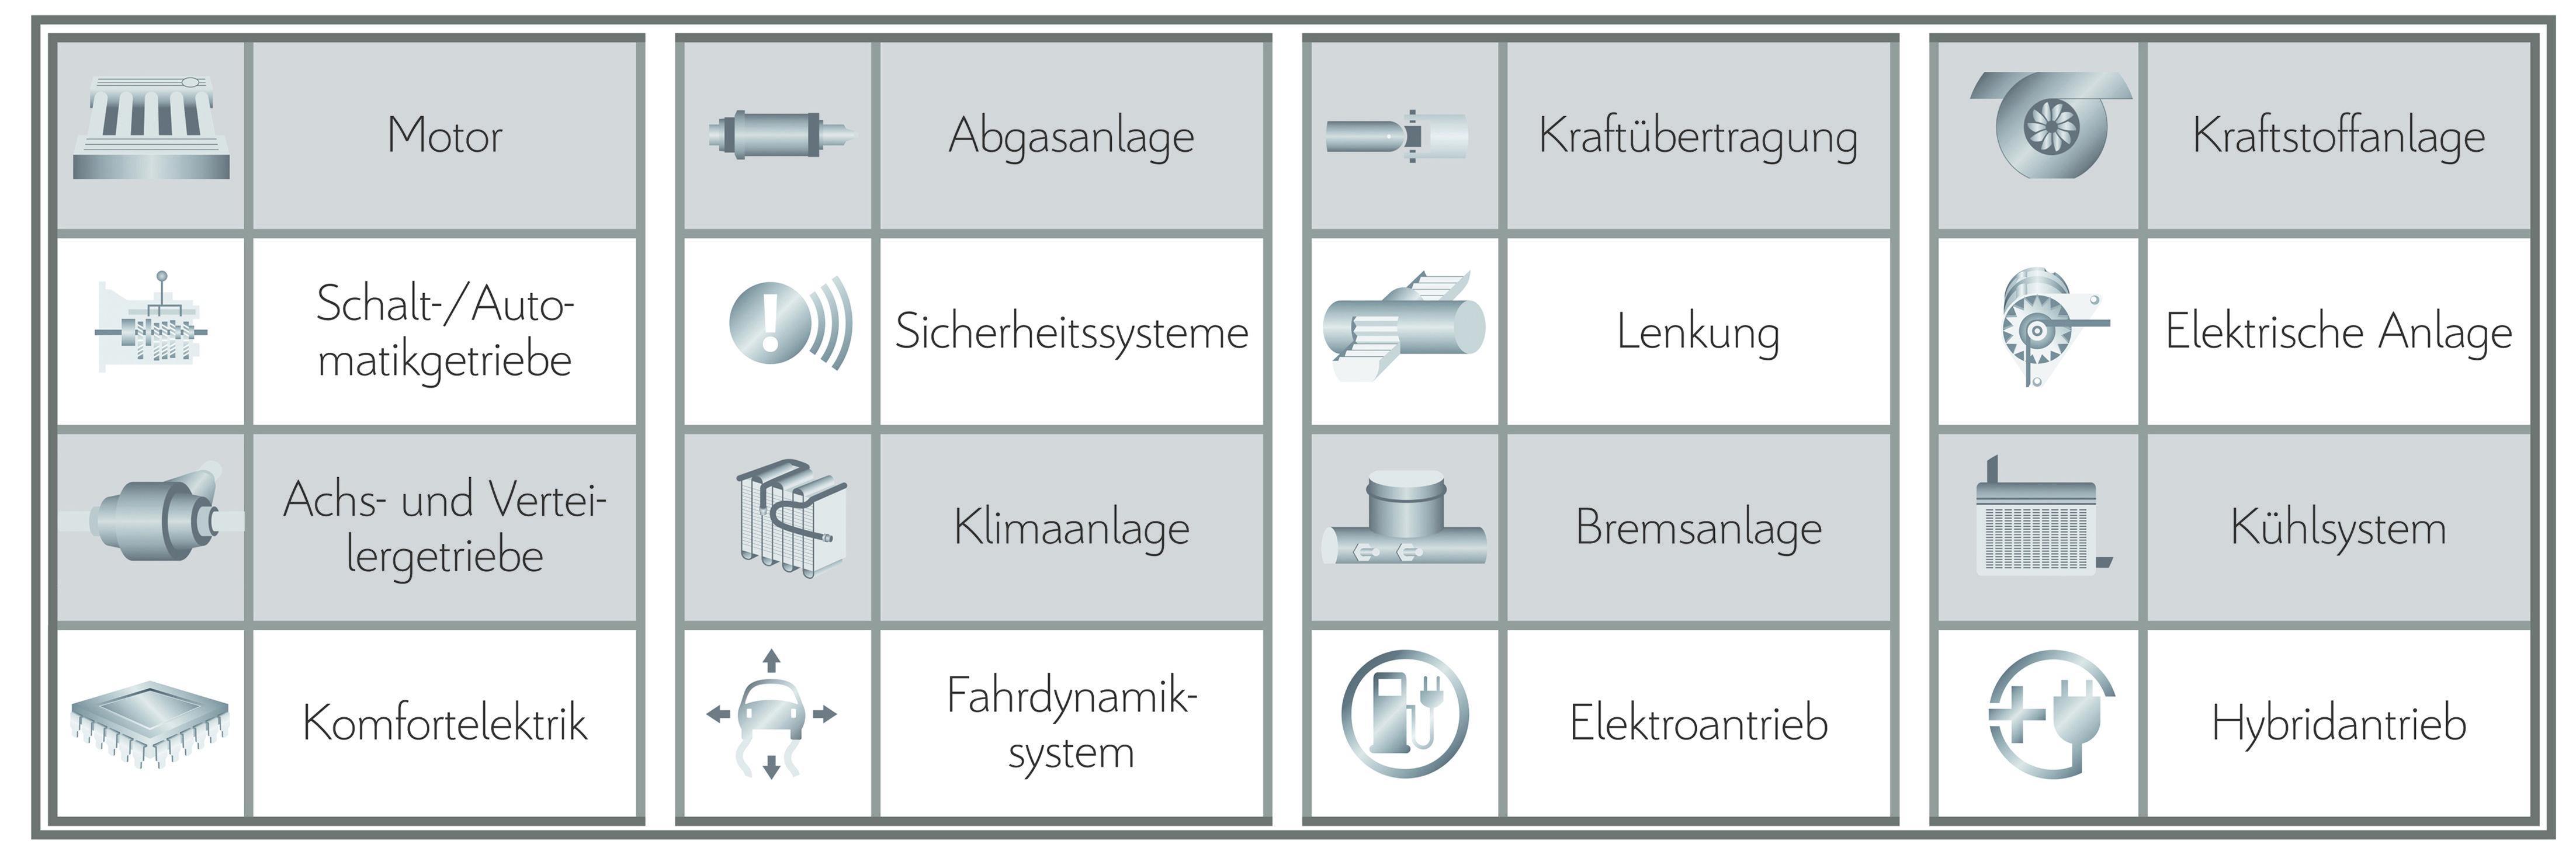 4_LZS-Tabelle-Bauteile-201904-compressor